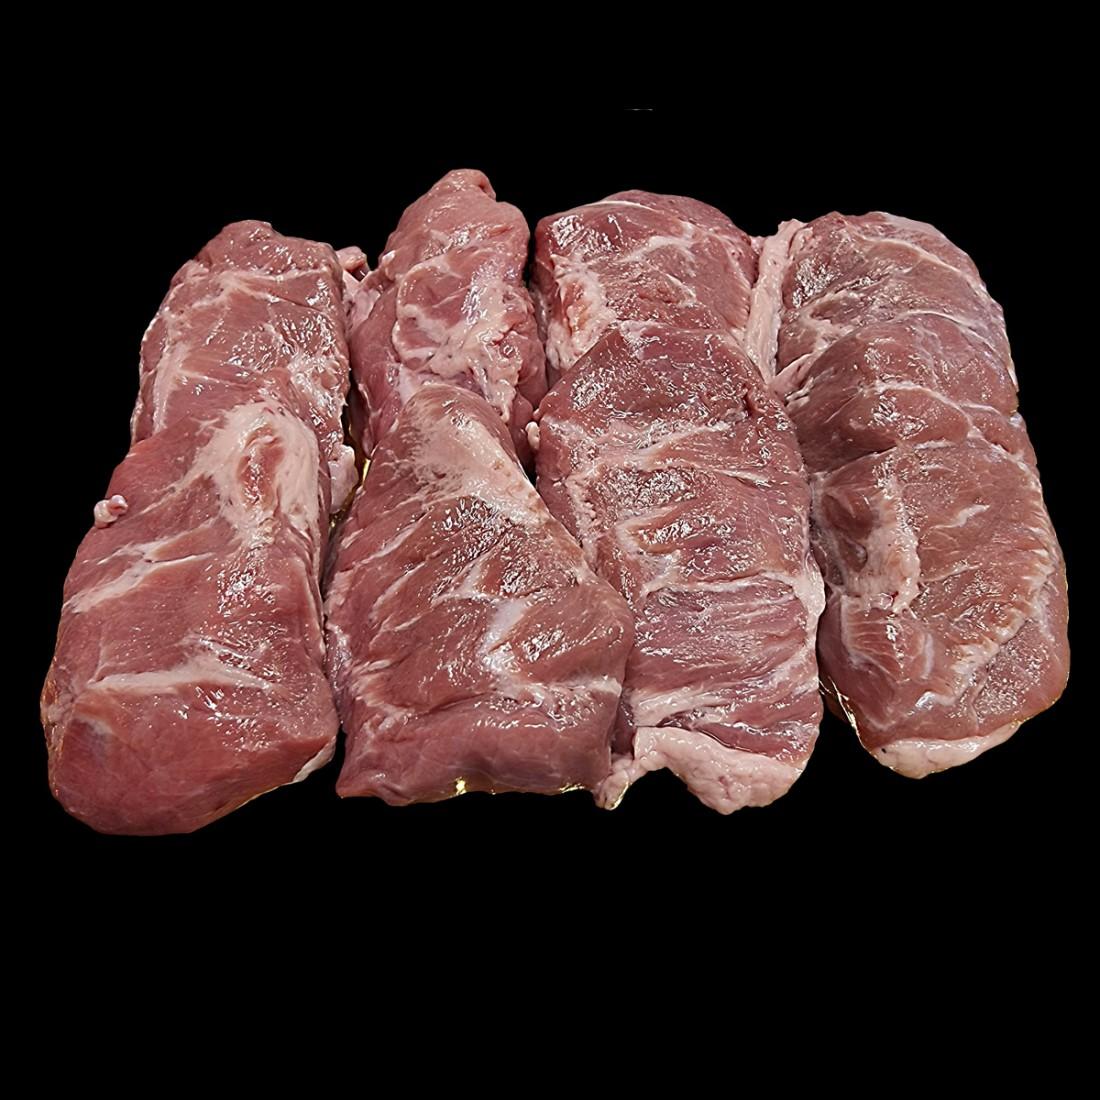 Cursos de Carne